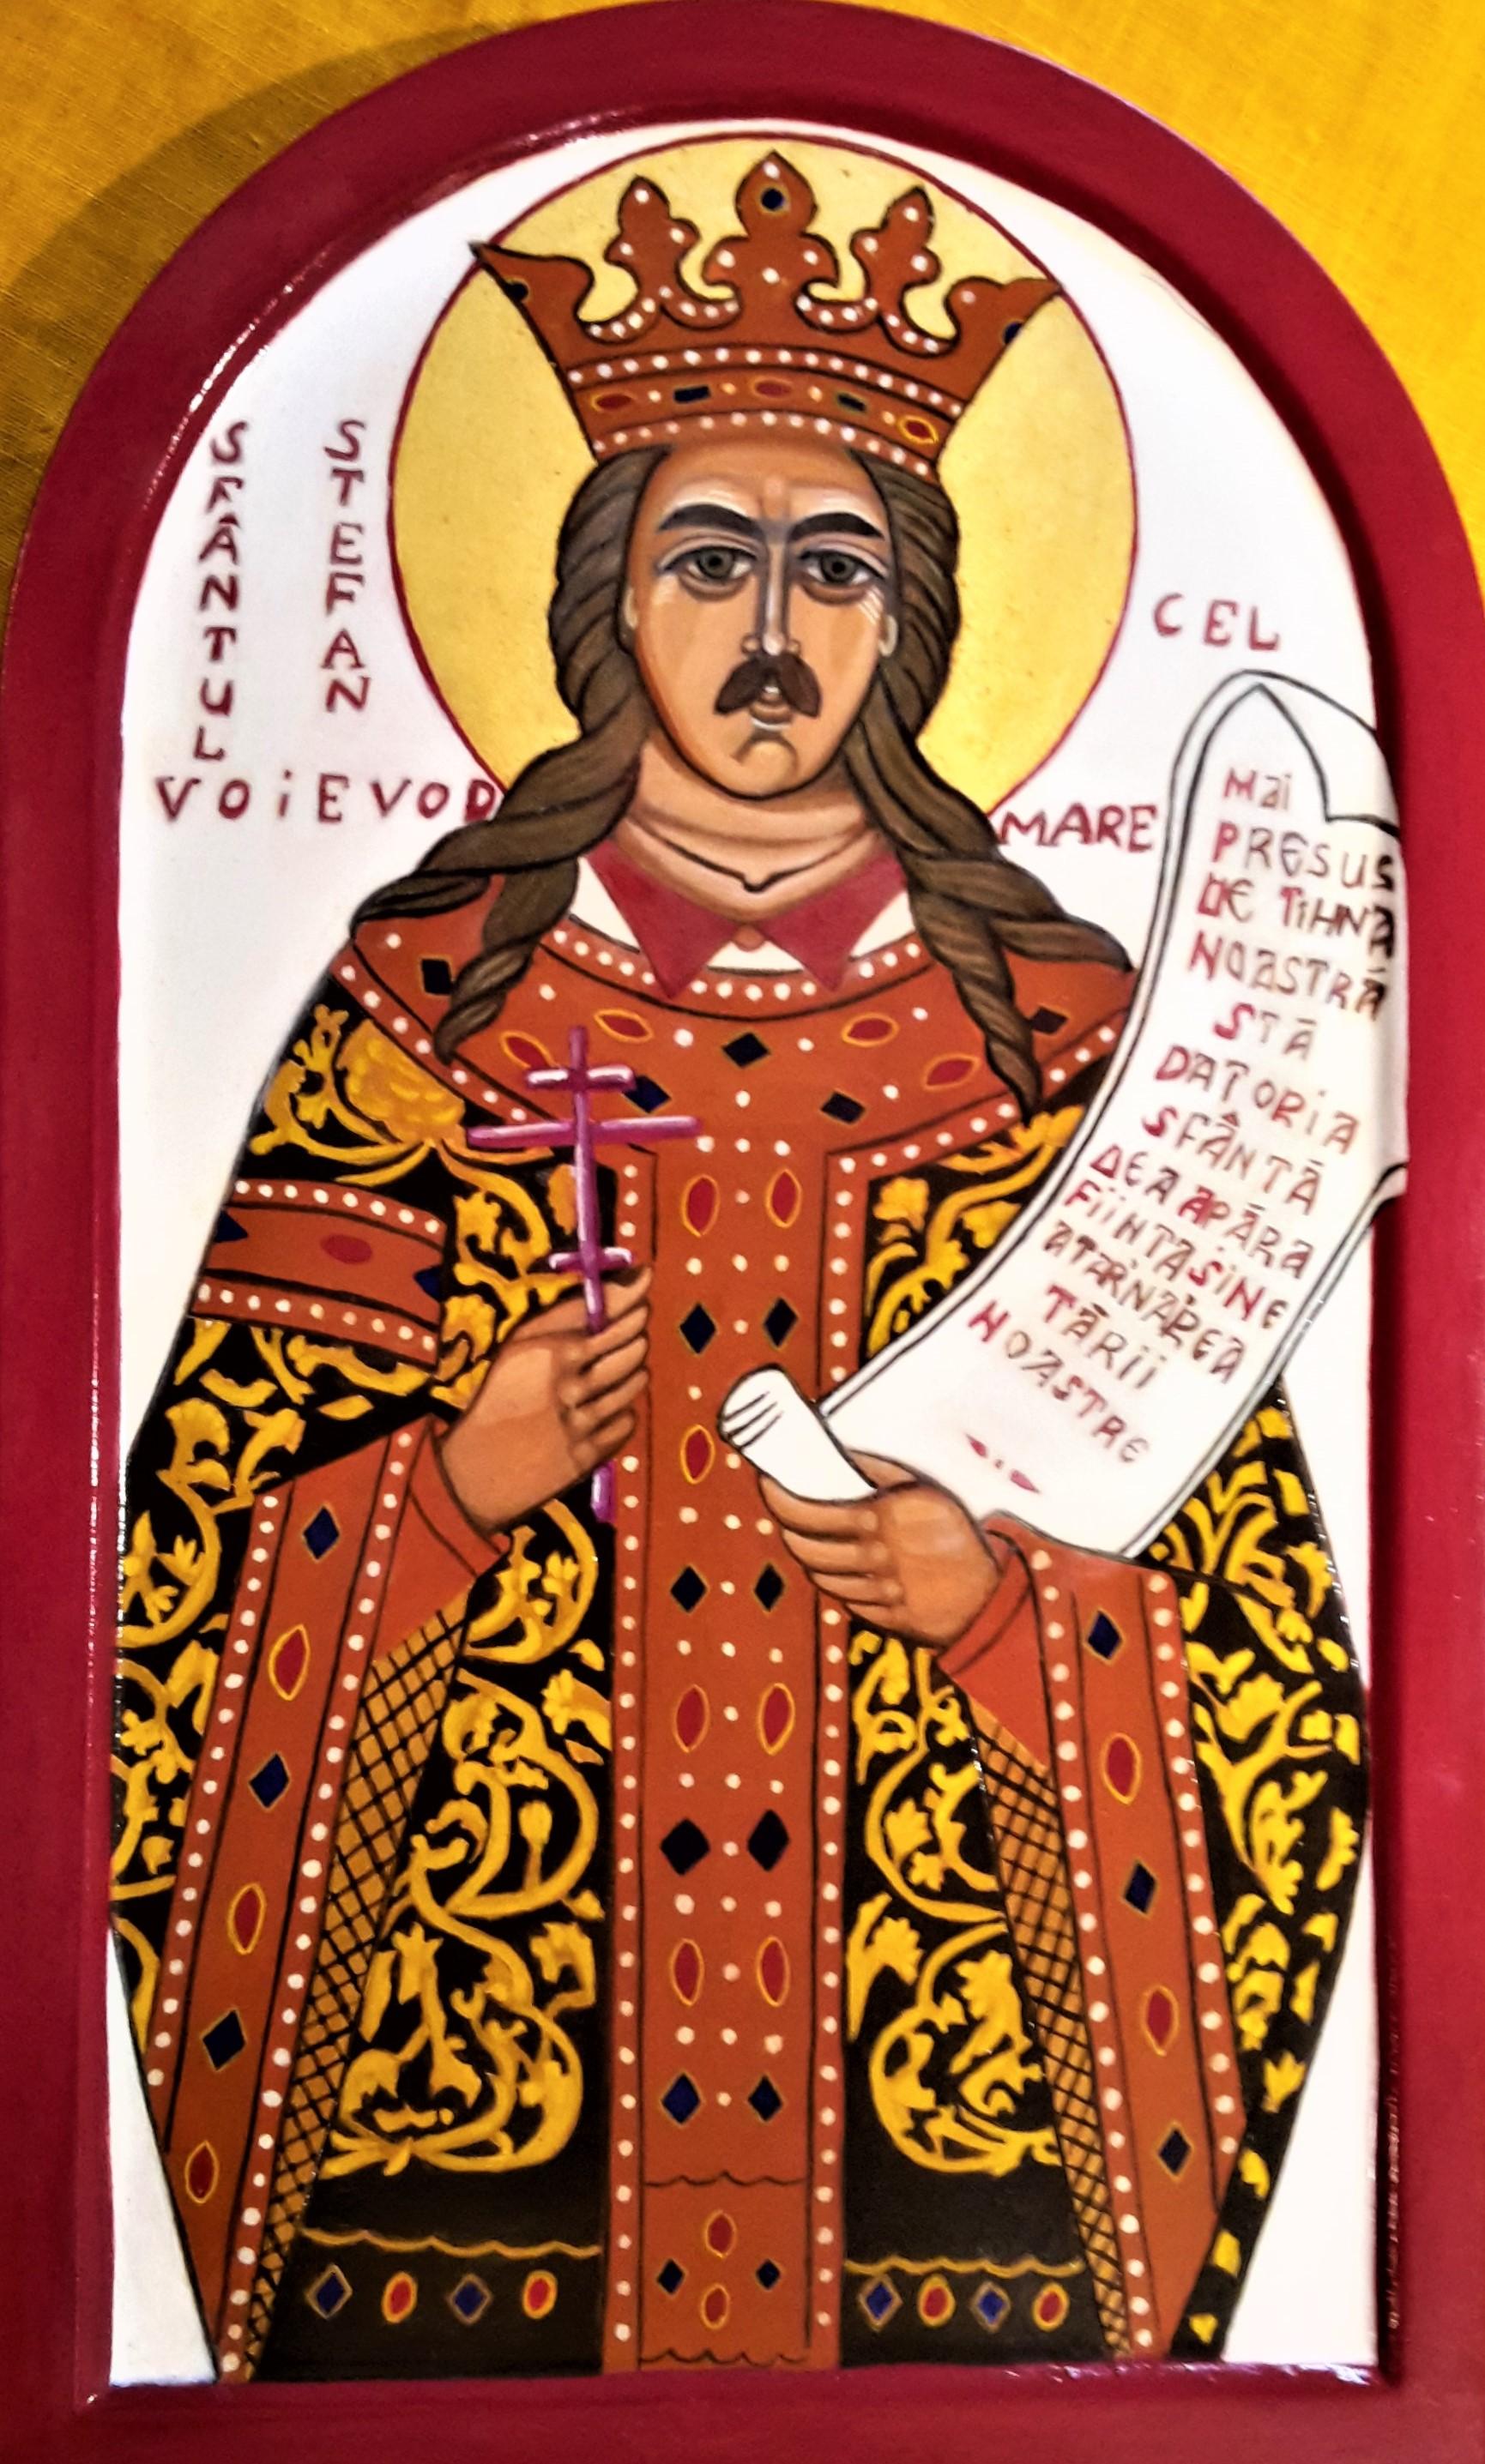 Saint roi Stéphane de Moldavie